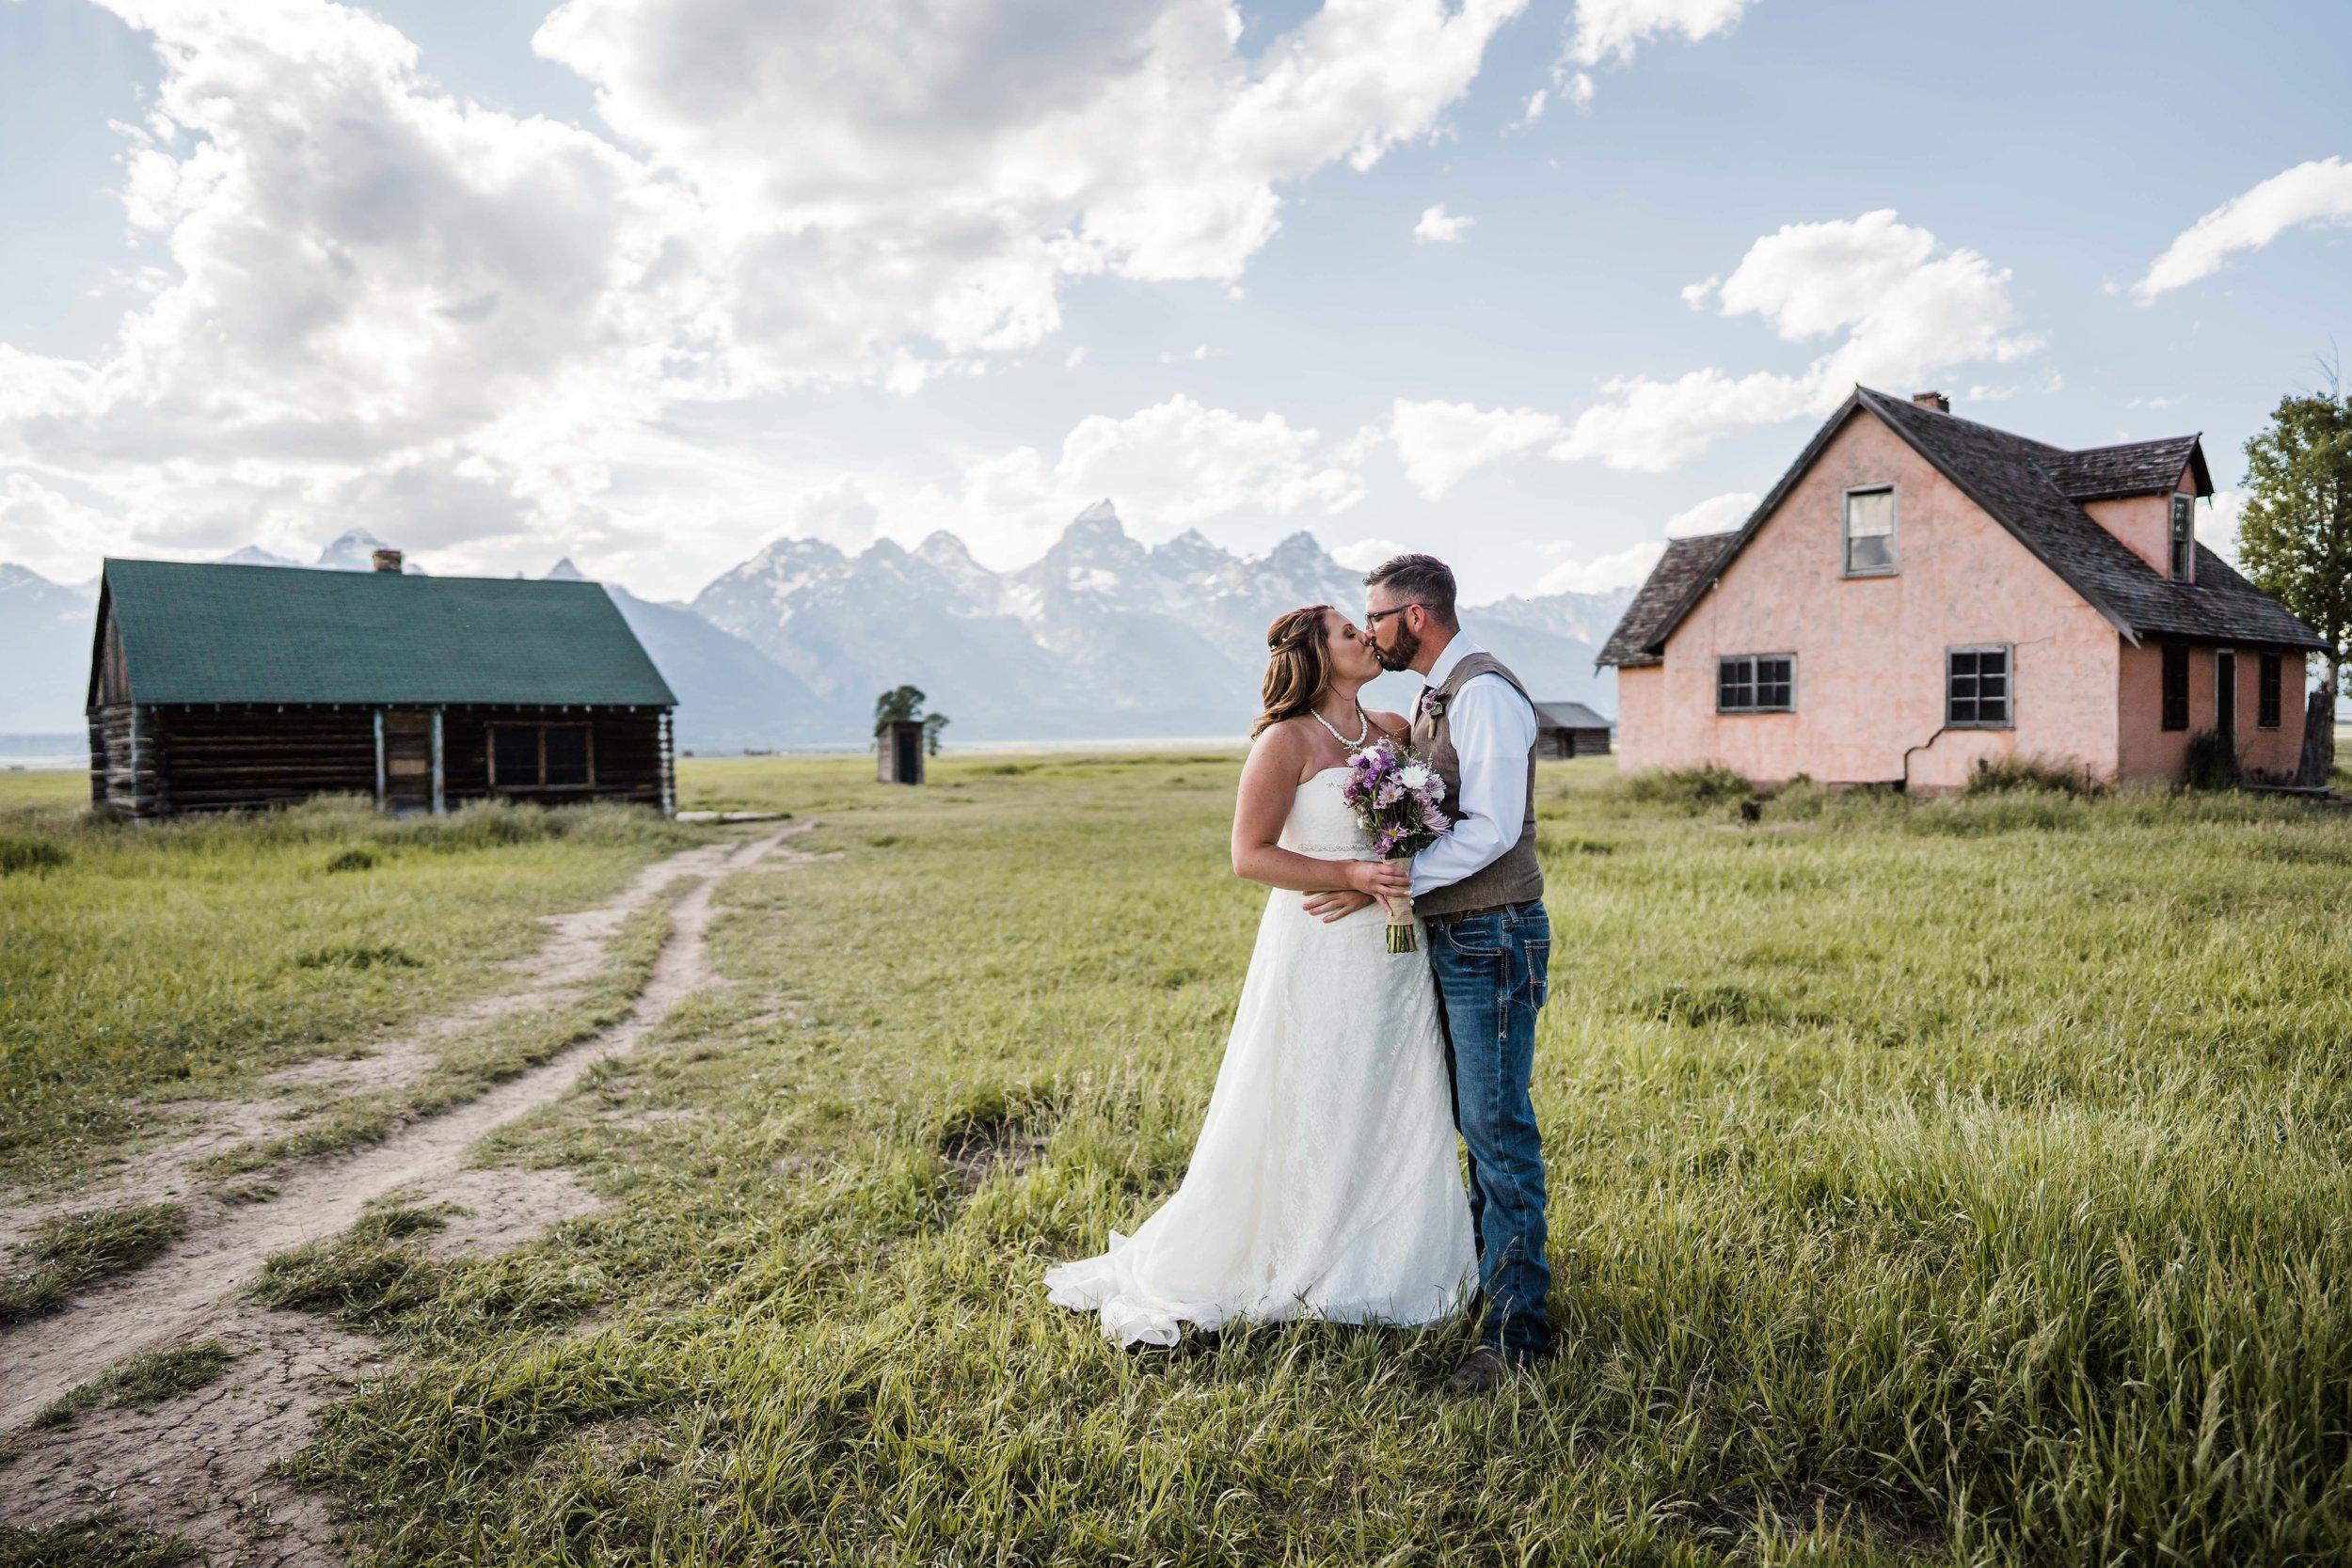 jackson hole adventure wedding photography at schwabachers landing in GTNP -DSD01256.jpg